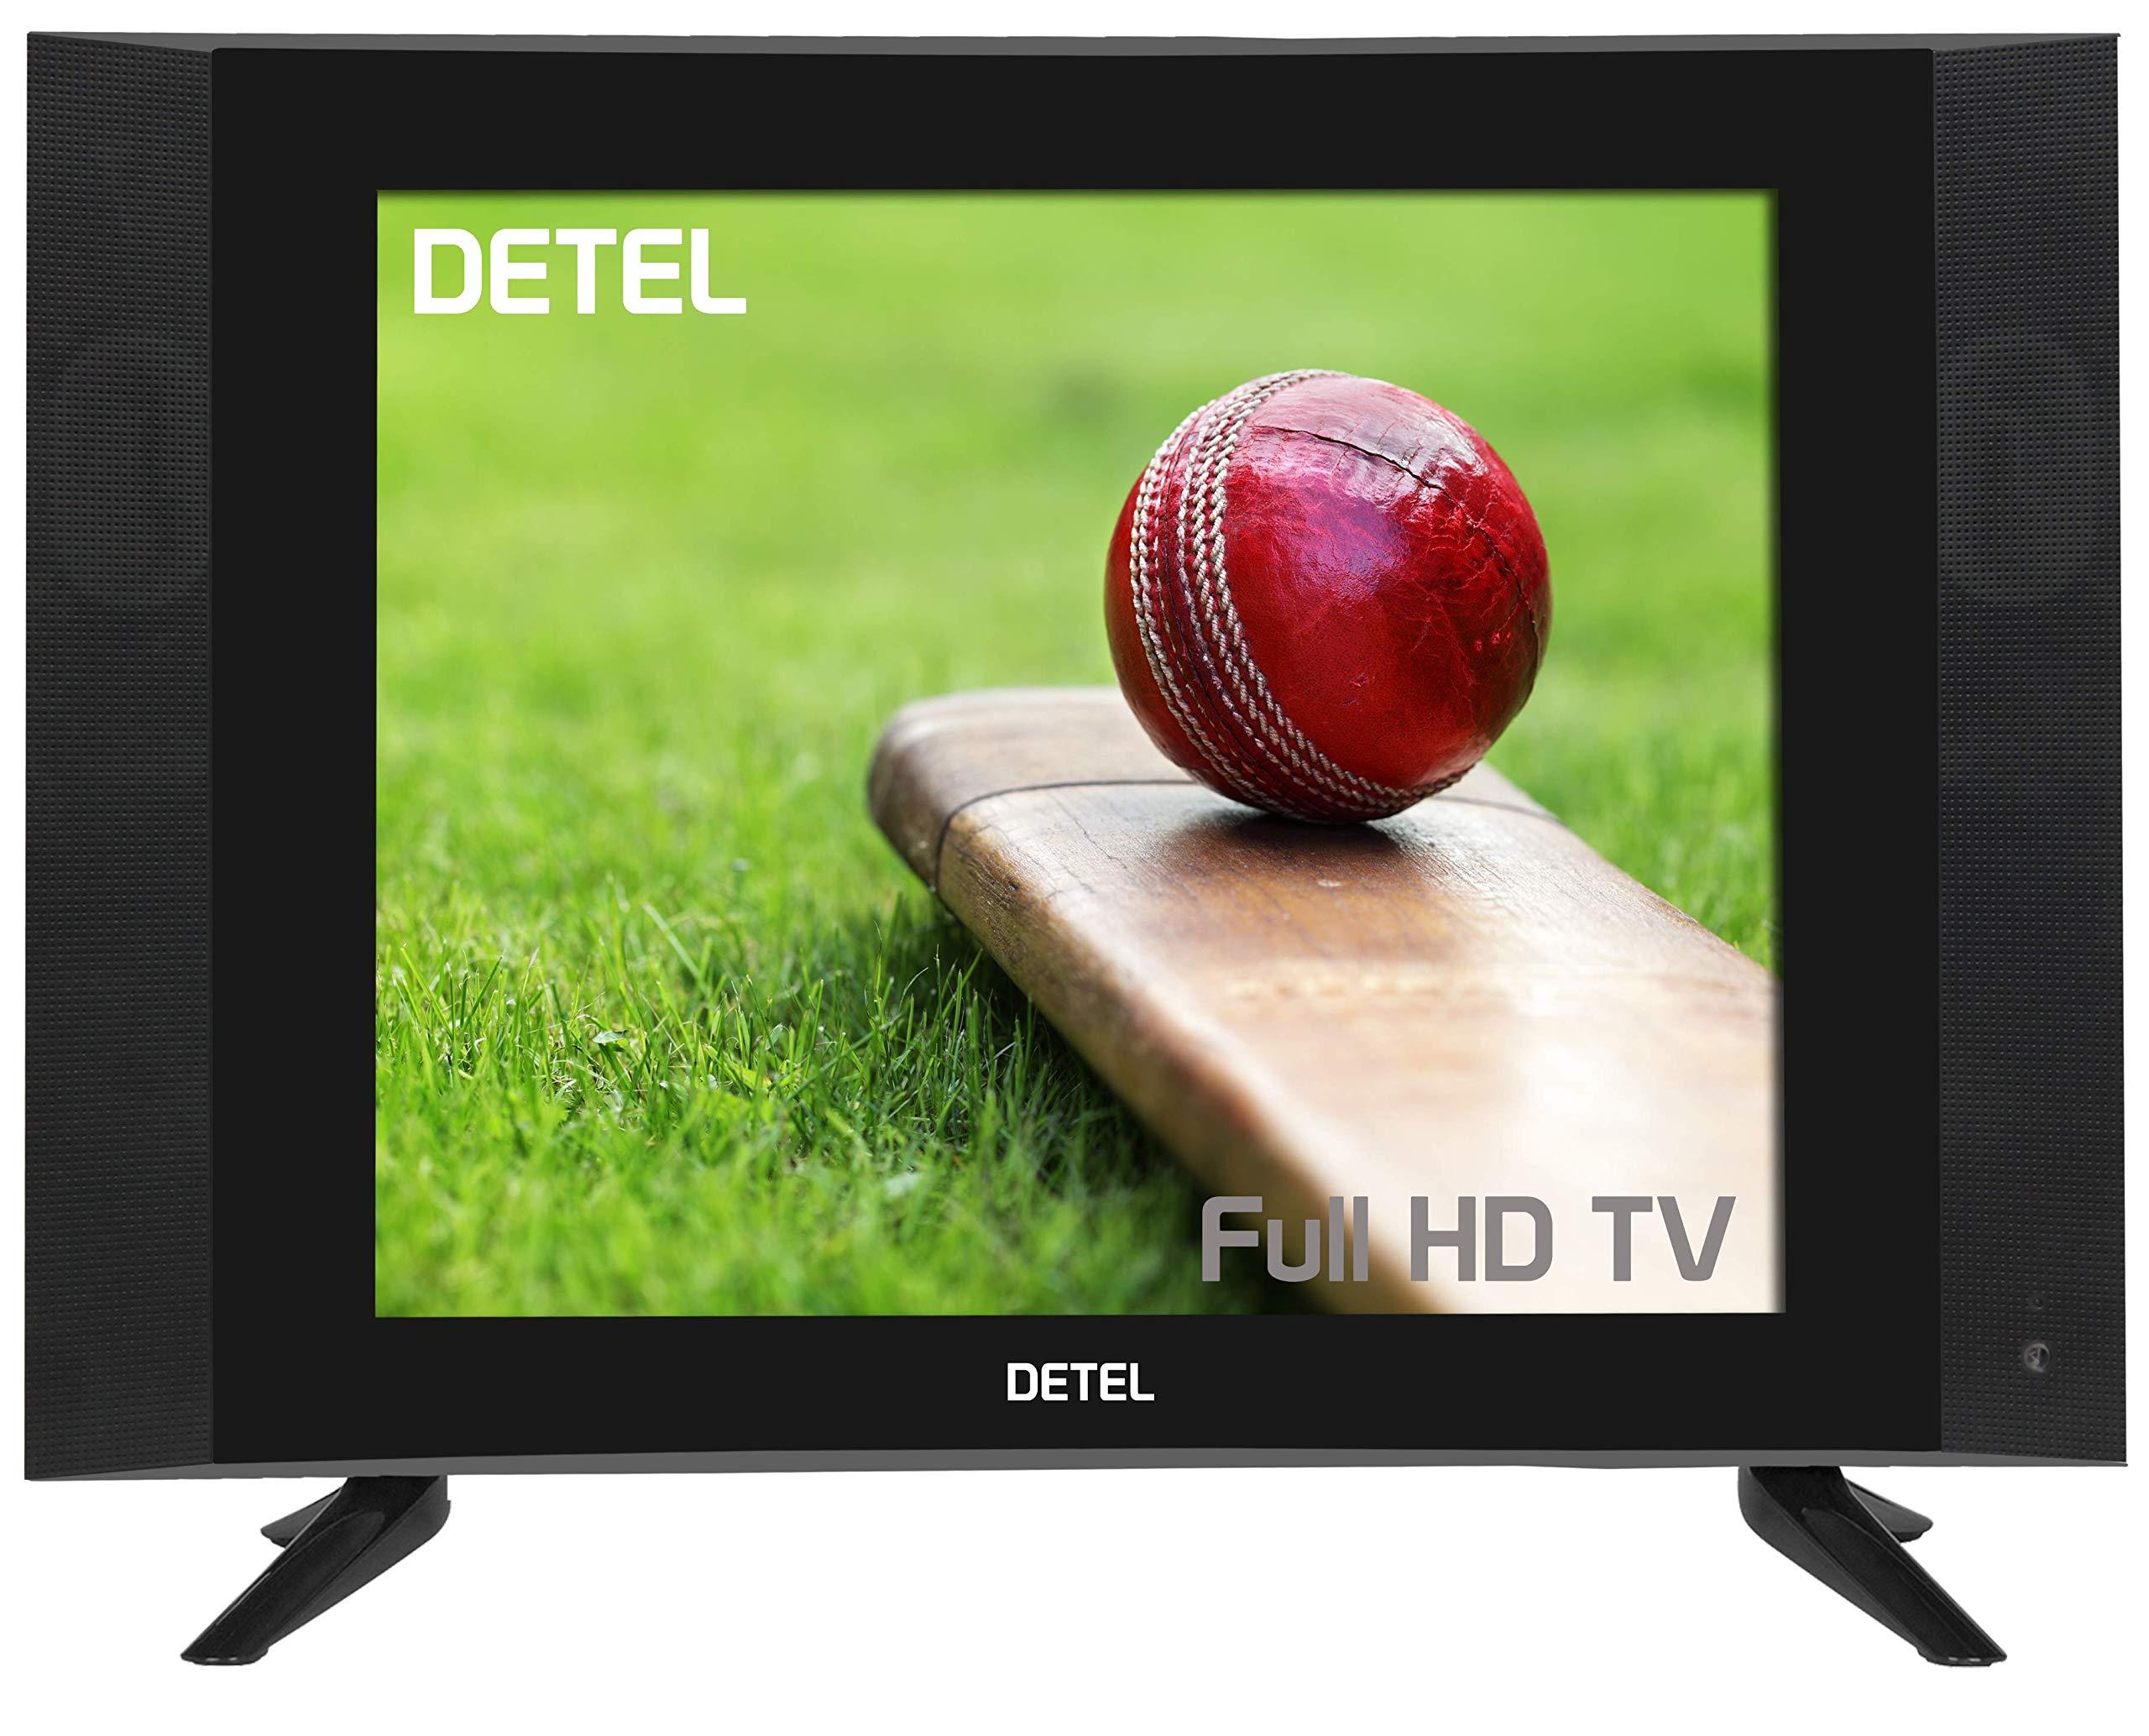 Detel 43cm (17 Inches) DI17F Full HD LED TV (Black) (2019 Model)